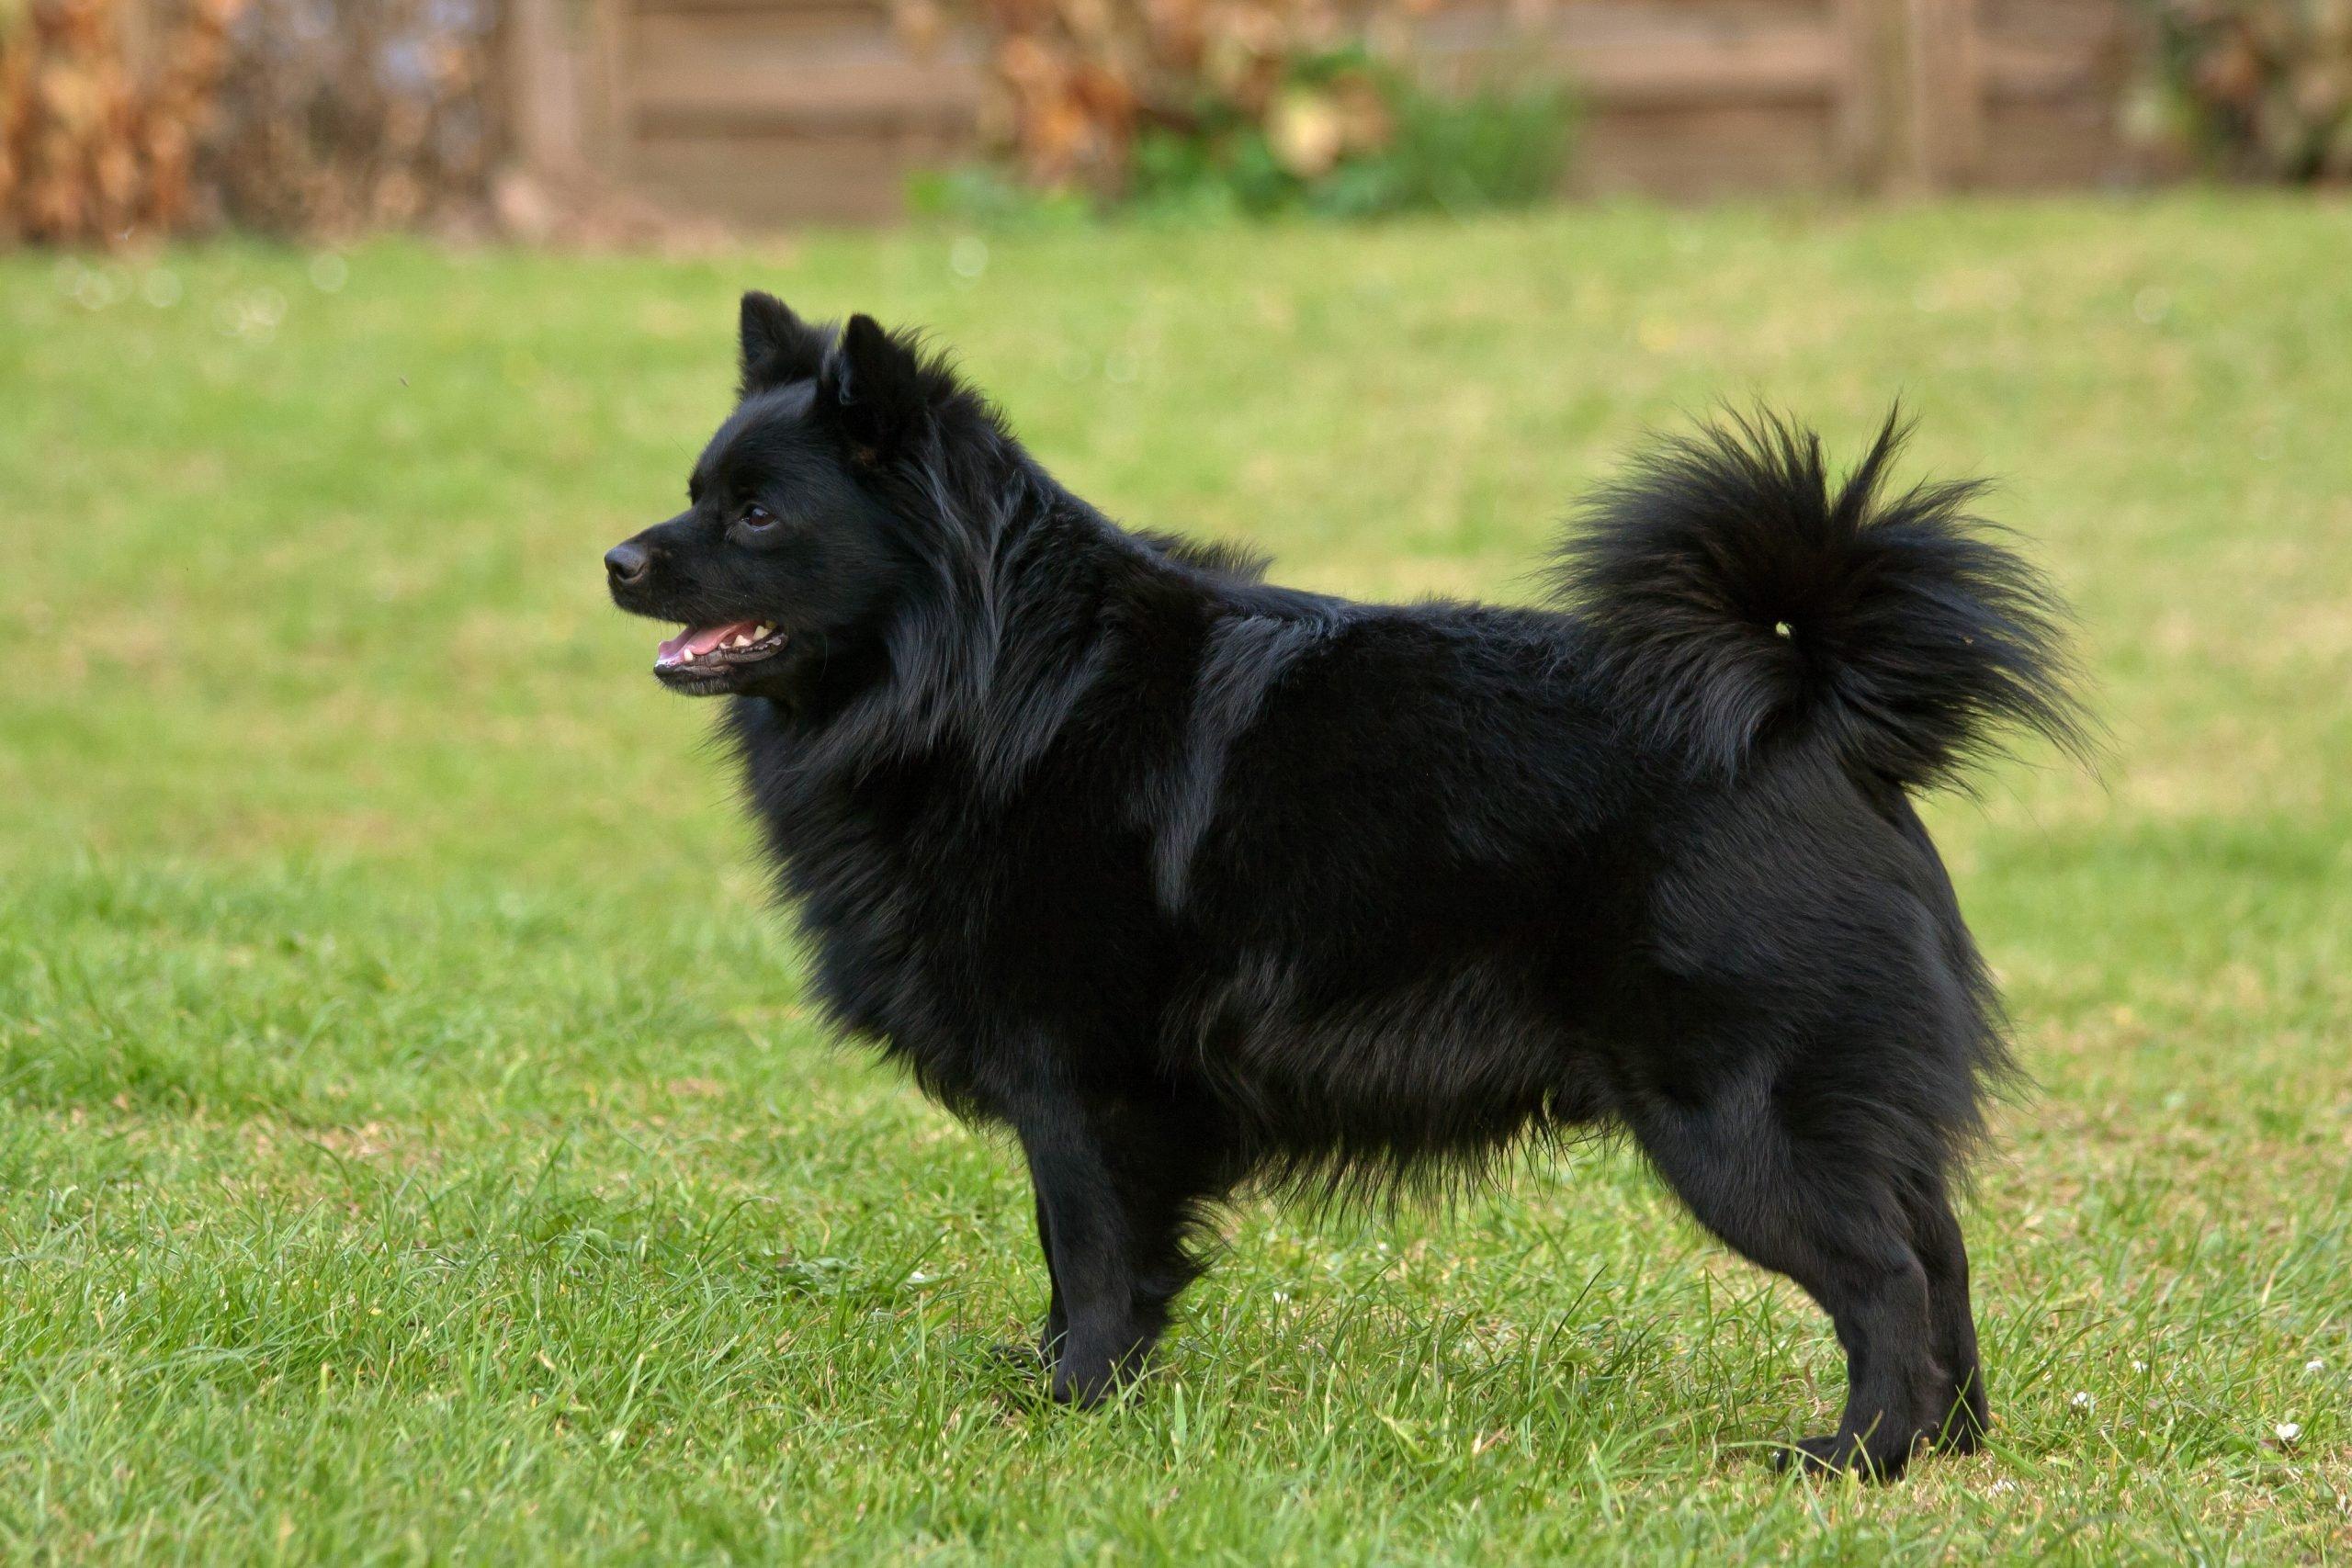 Black Dog On Grass